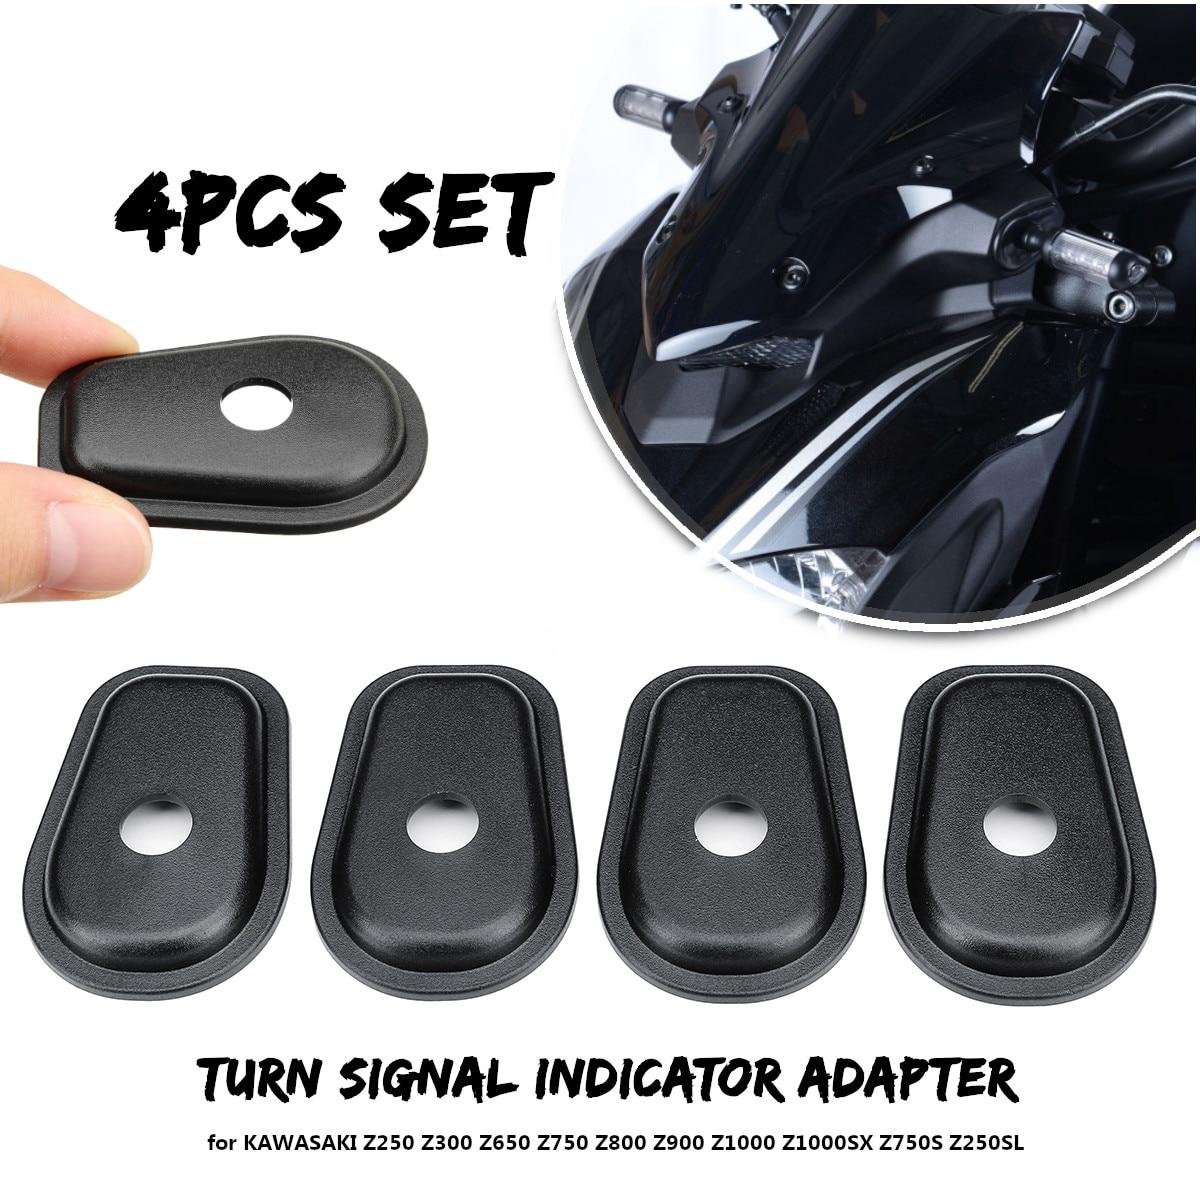 Motorcycle Turn Signal Indicator Adapter Spacers for Kawasaki Z750 2007-2013